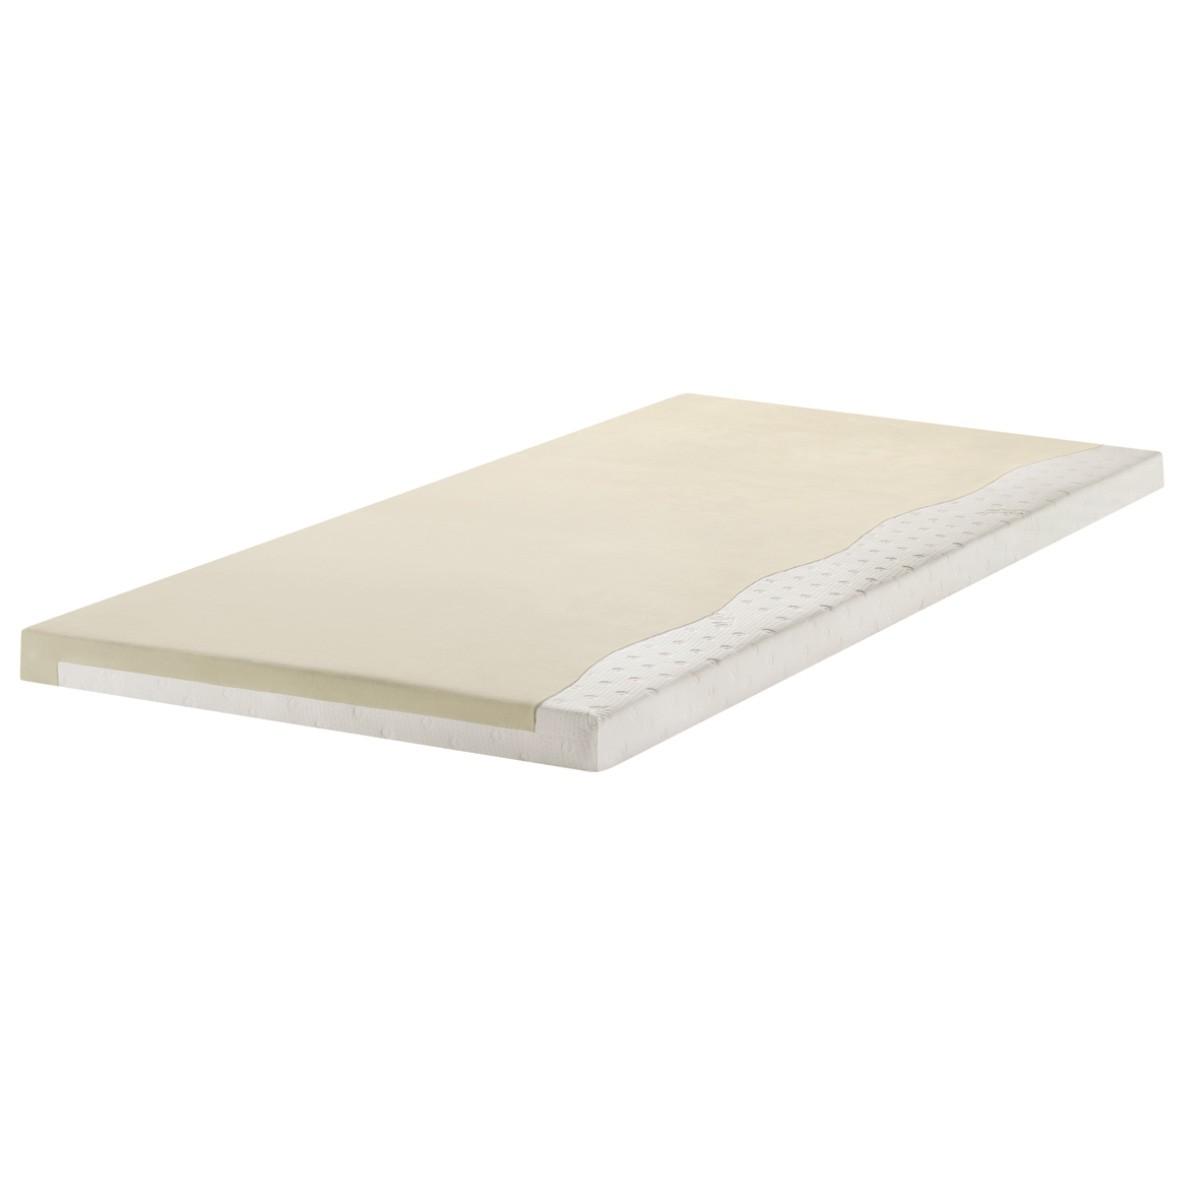 comfort topper 7 cm tempur tempur top mattresses. Black Bedroom Furniture Sets. Home Design Ideas